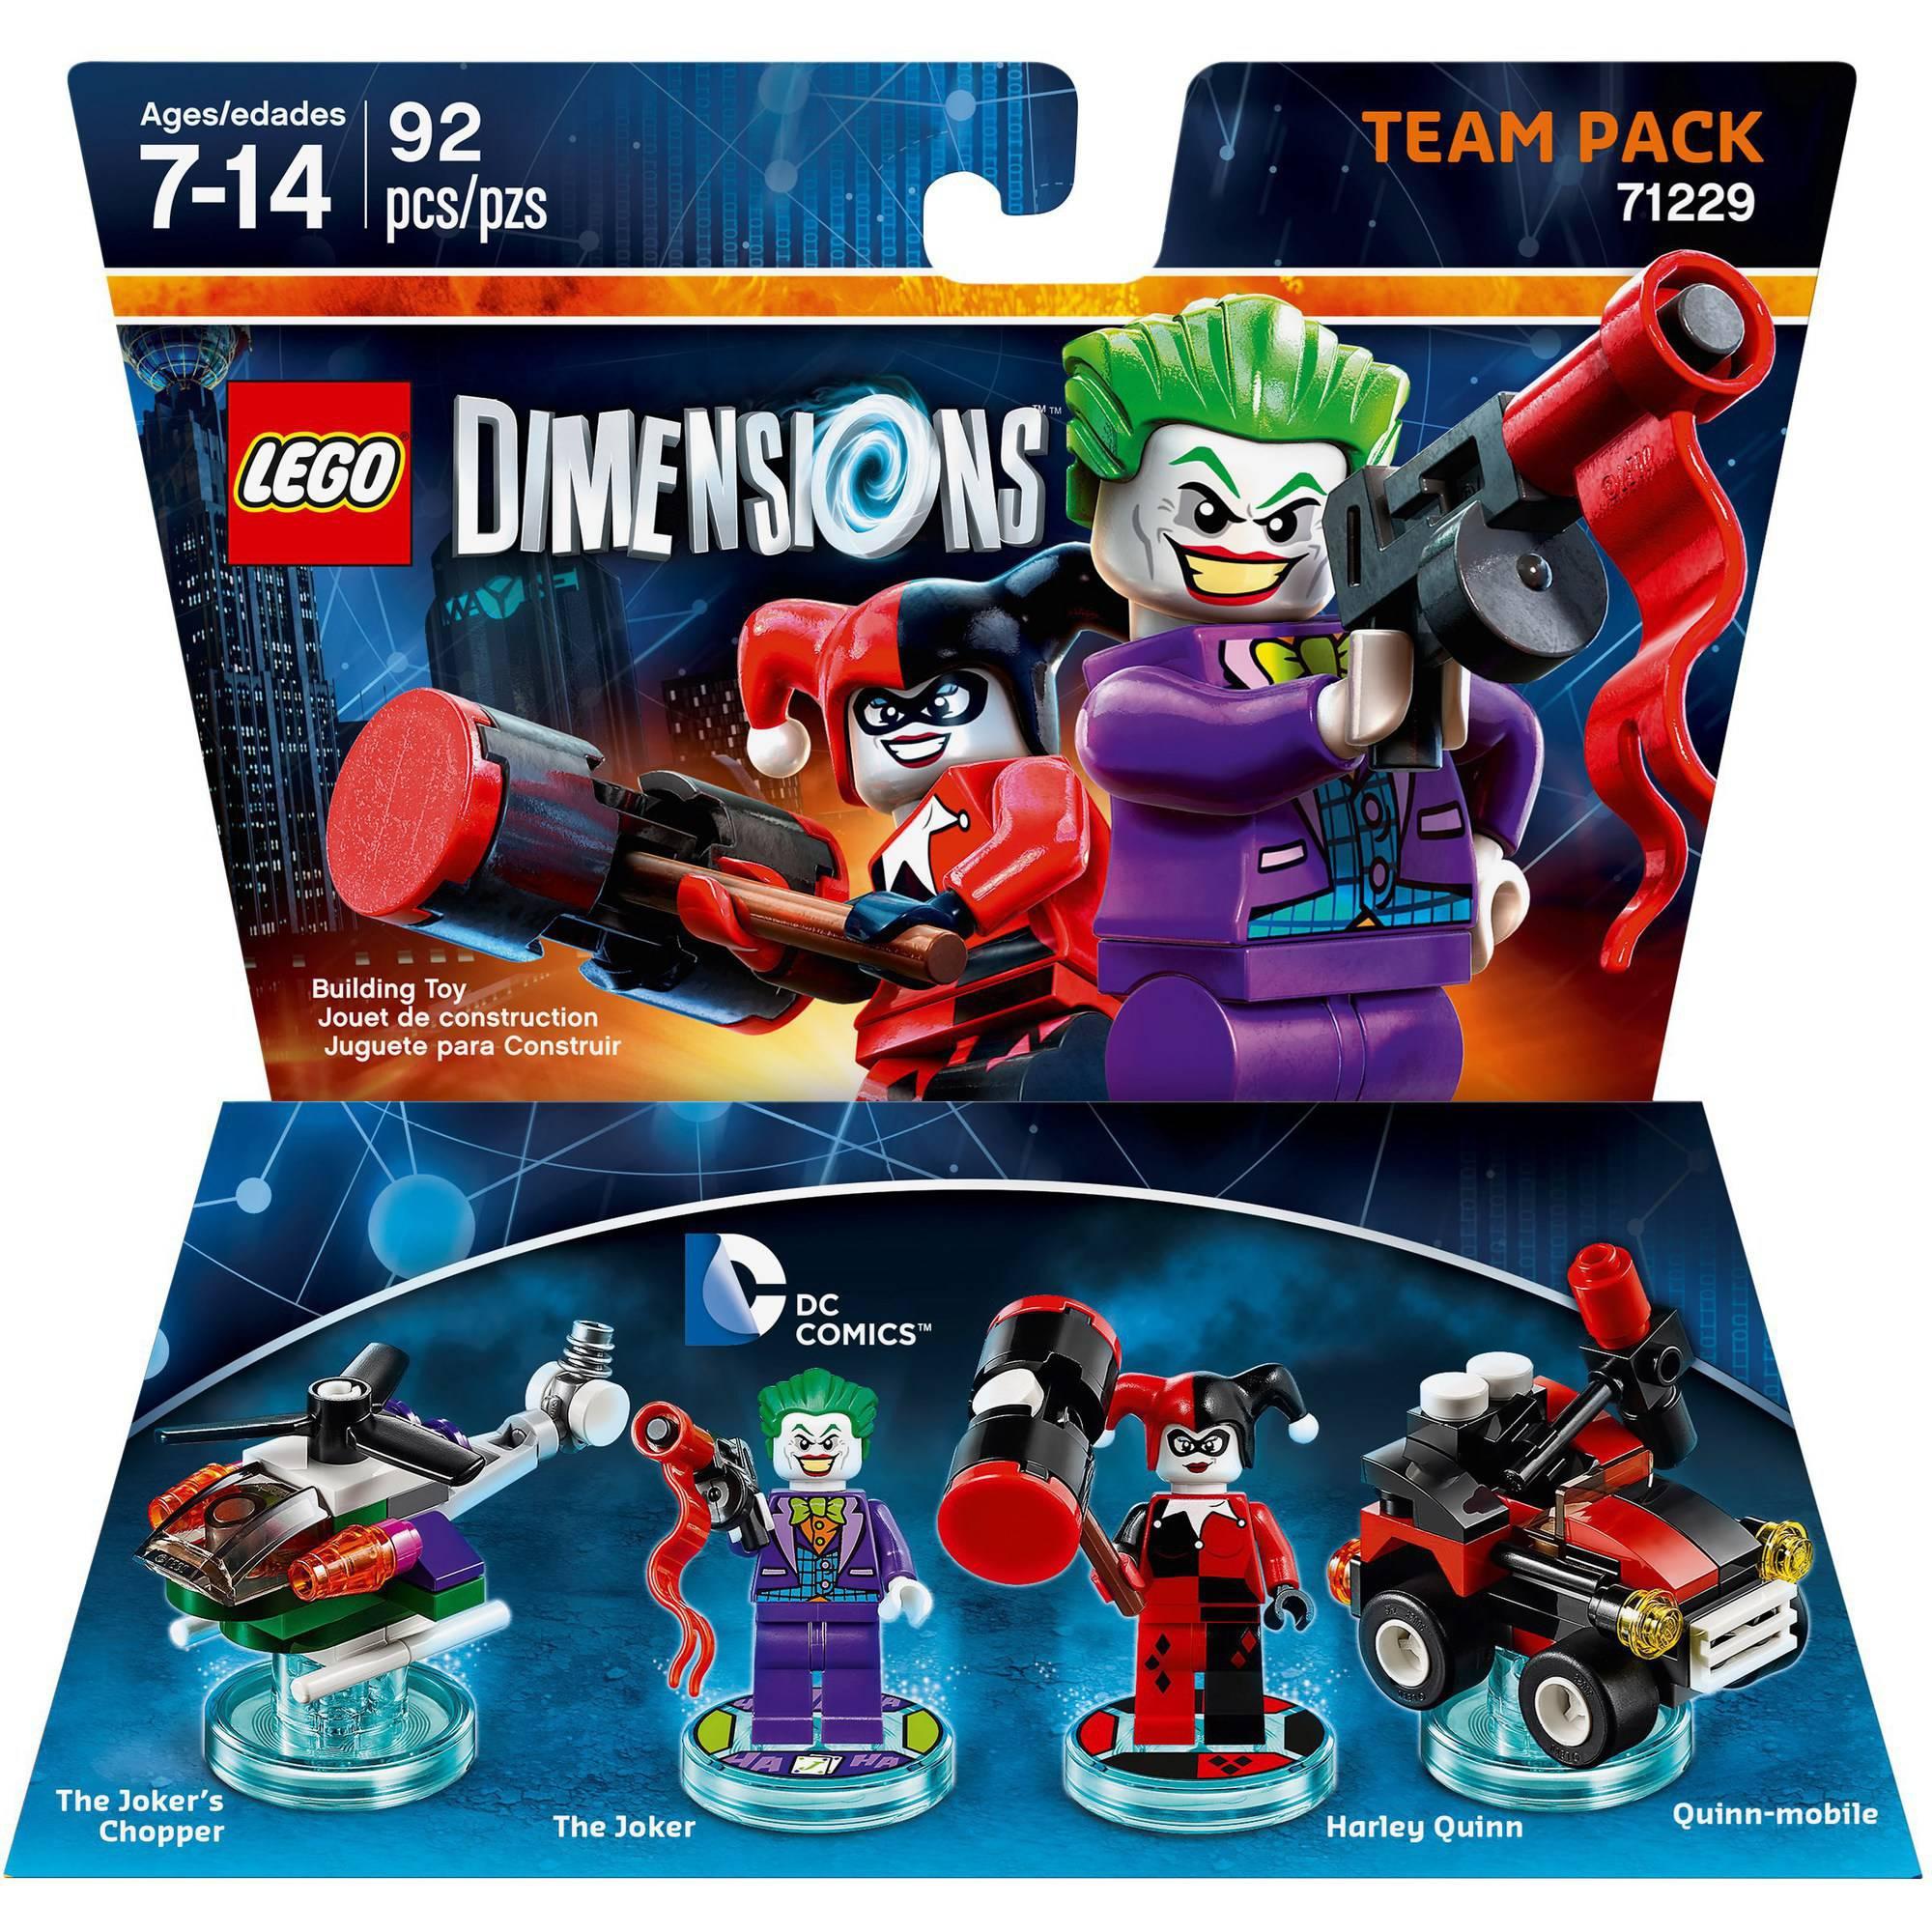 LEGO Dimensions DC Comics Team Pack (Universal)